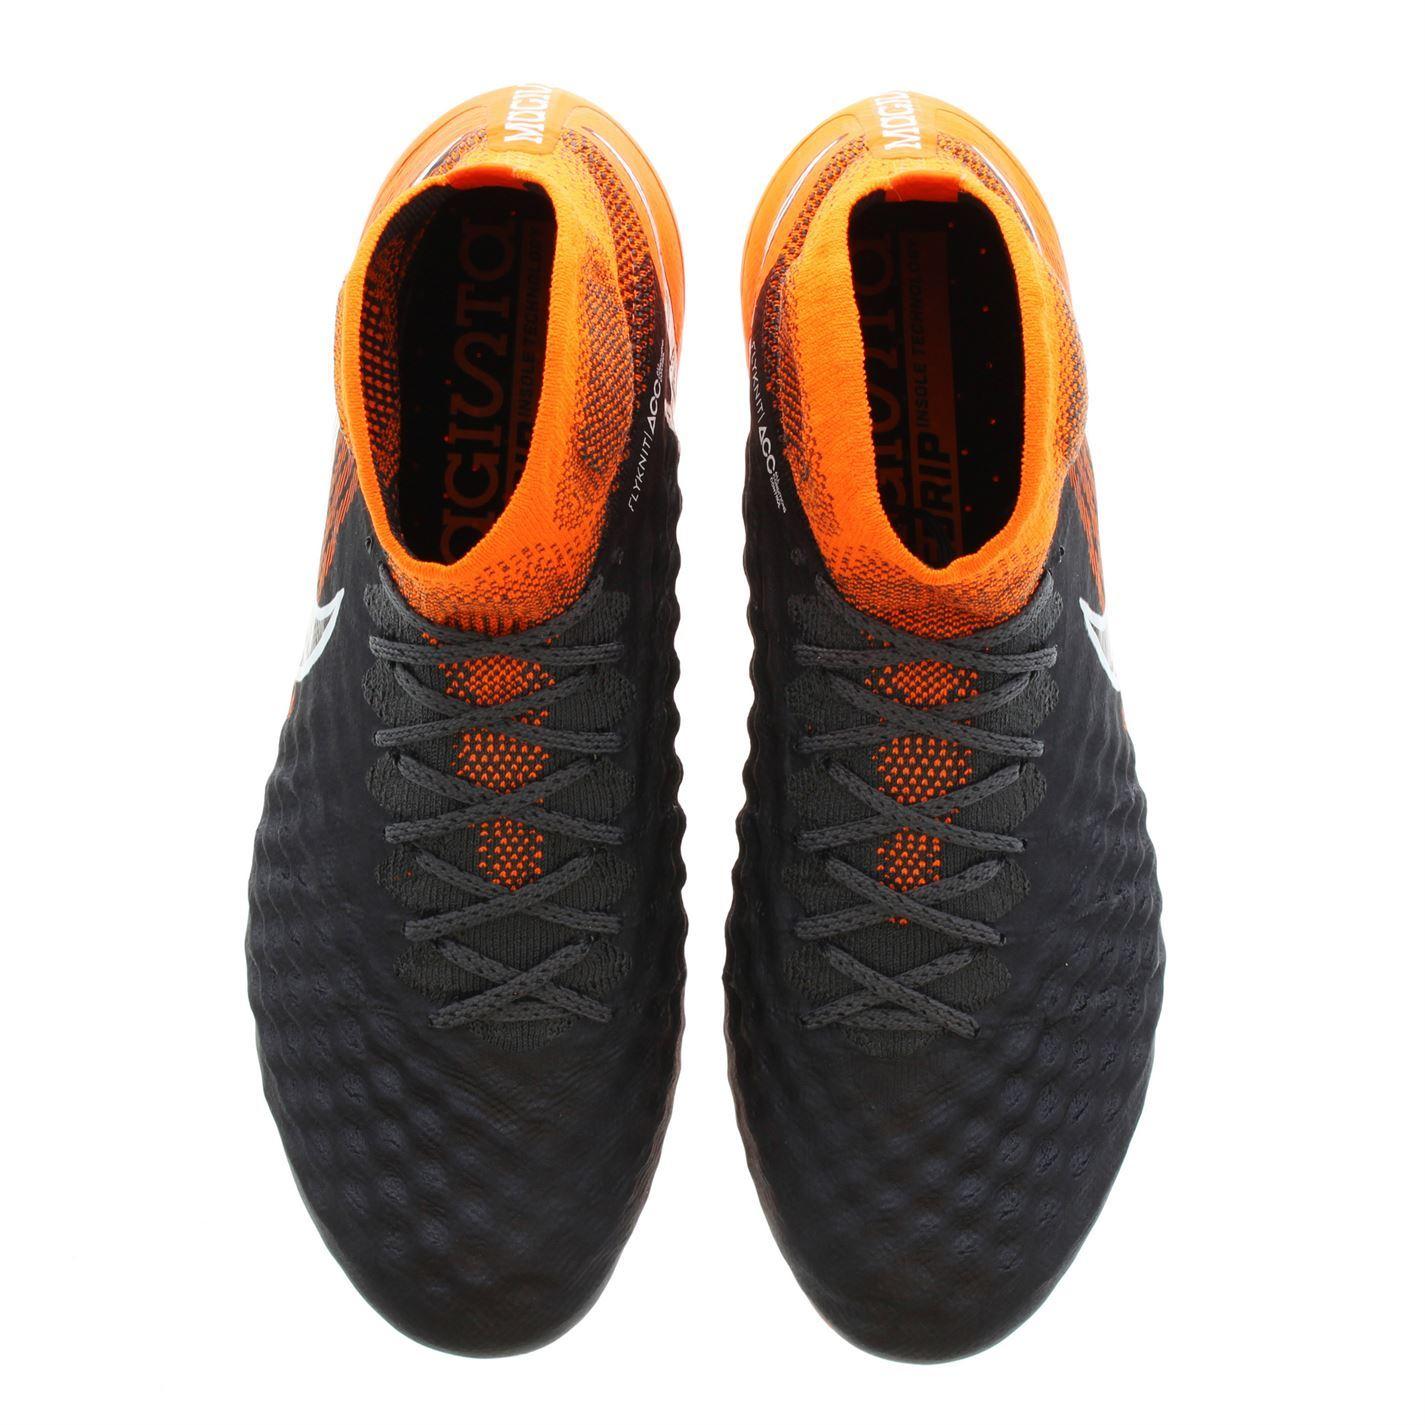 Nike Roshe Run Retro Gelb ur8Hi [Schuhe Nike 525407